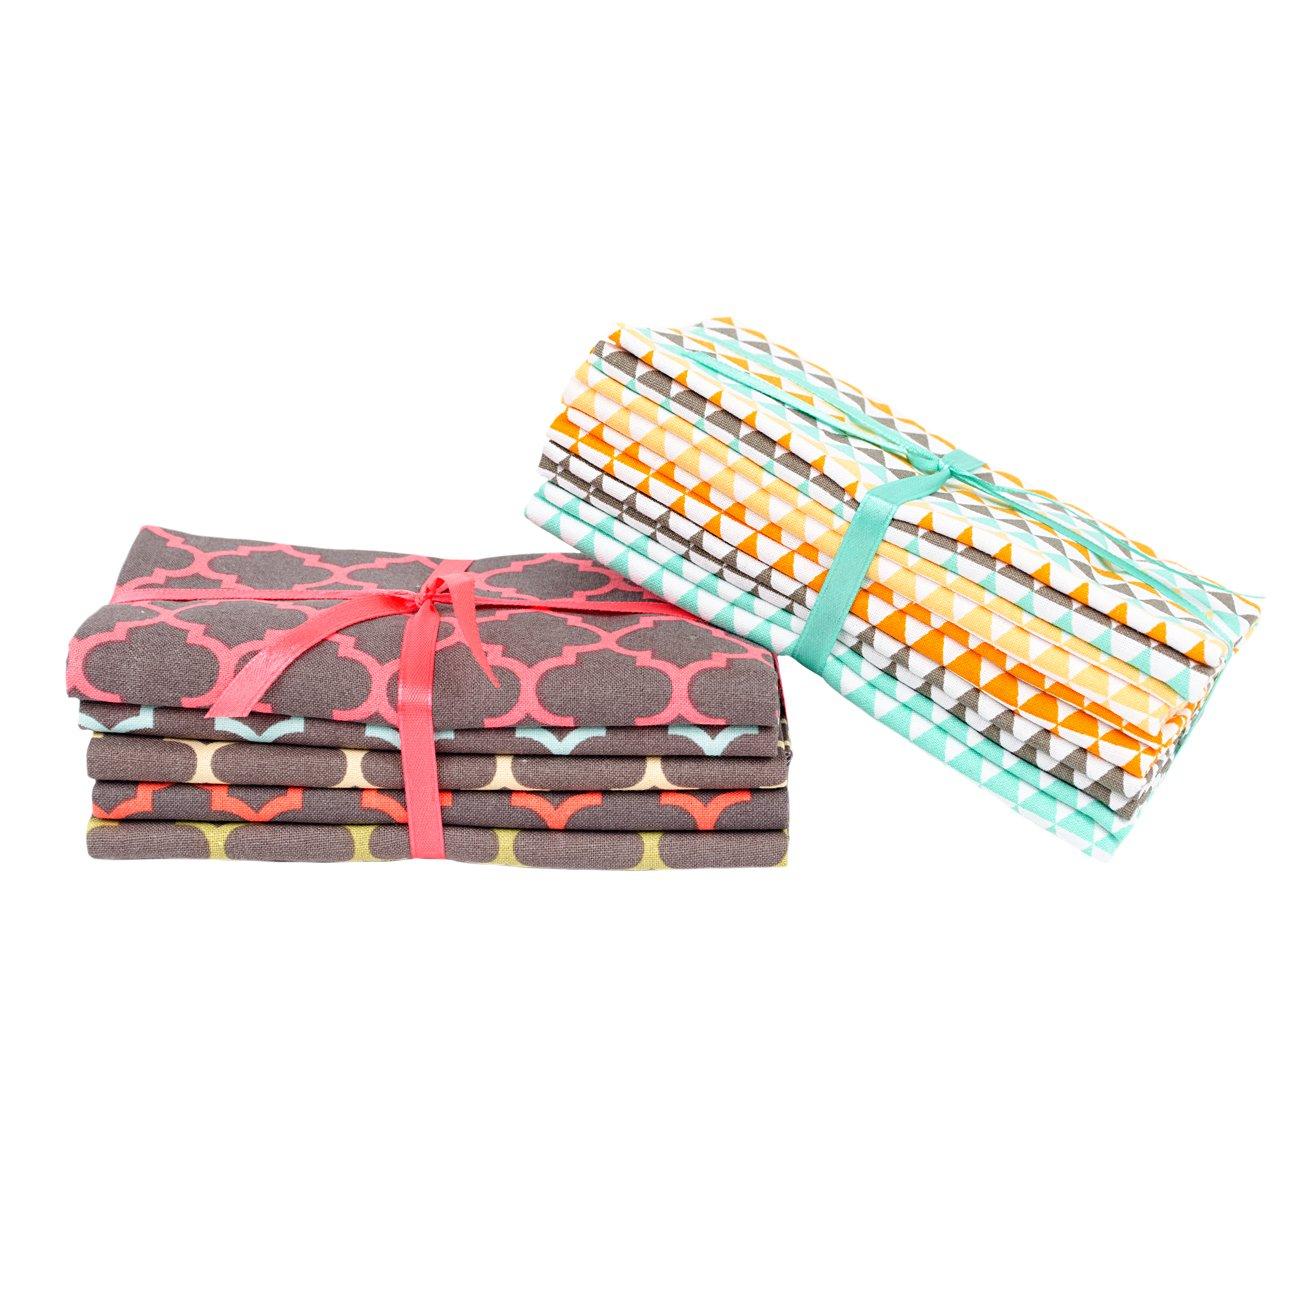 Fabric Palette 5pc Bundle<br>Blenders<br>MD-G-BND62